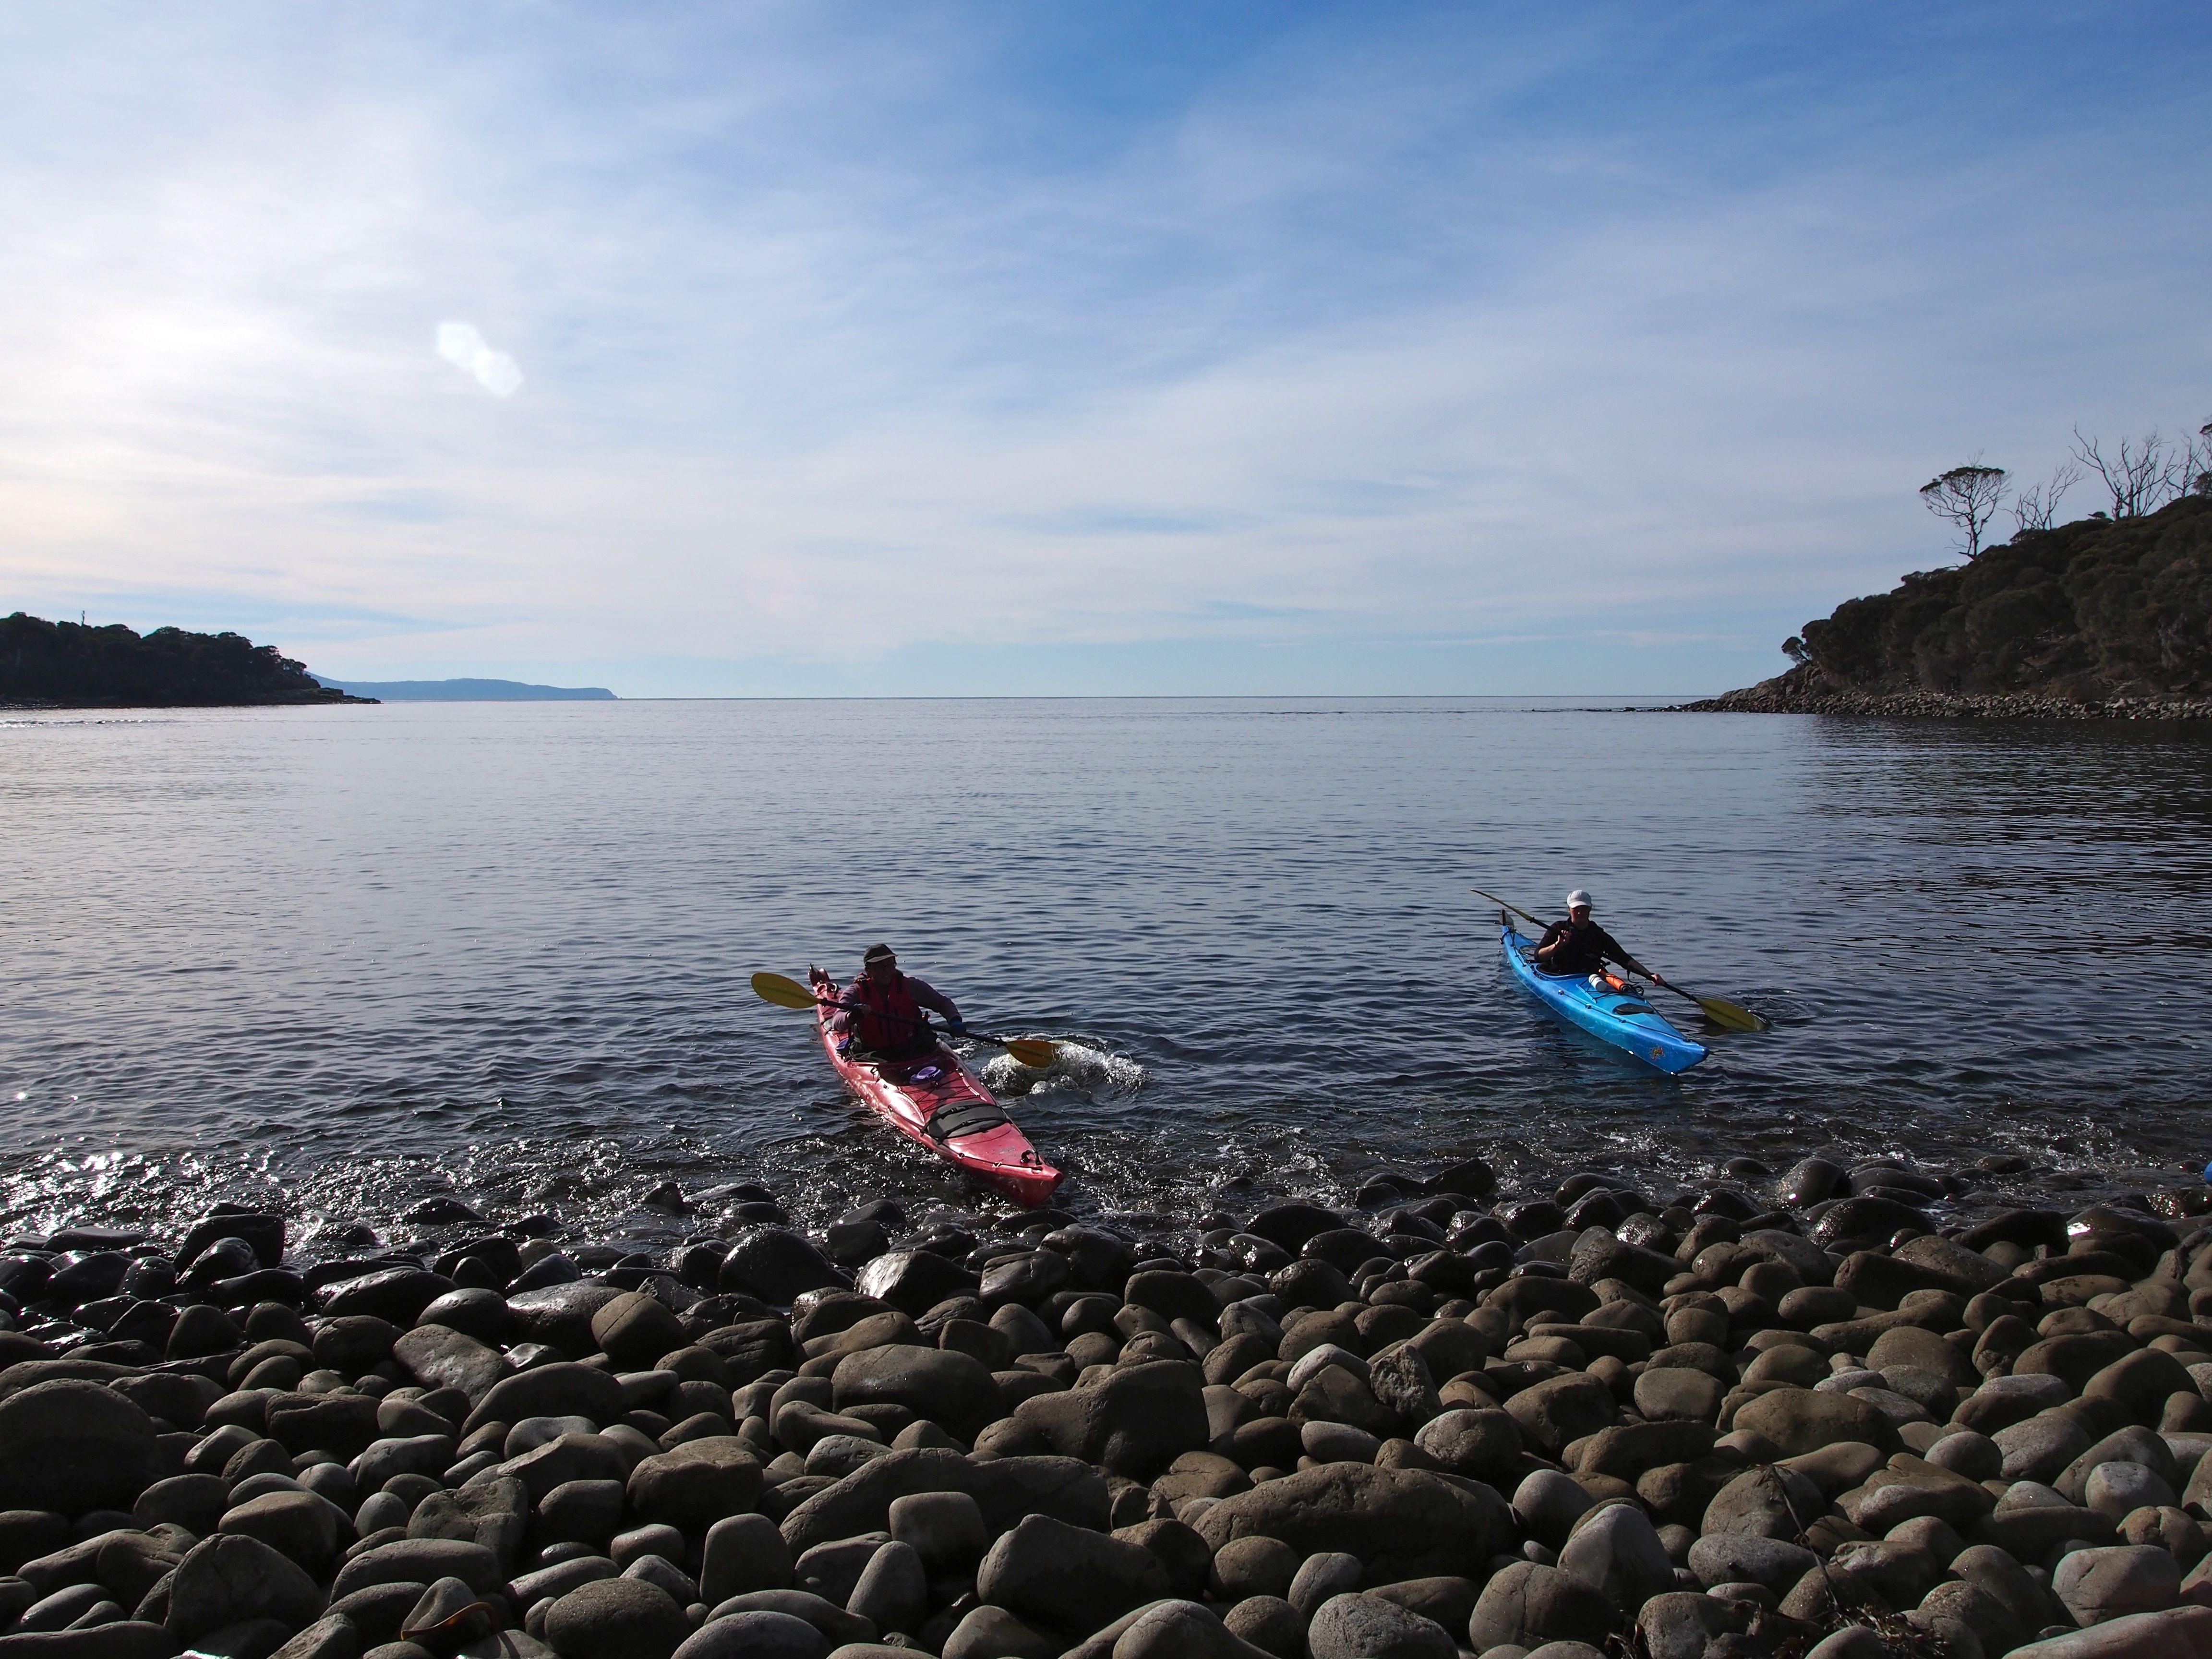 Pulling in to Tasman Bay